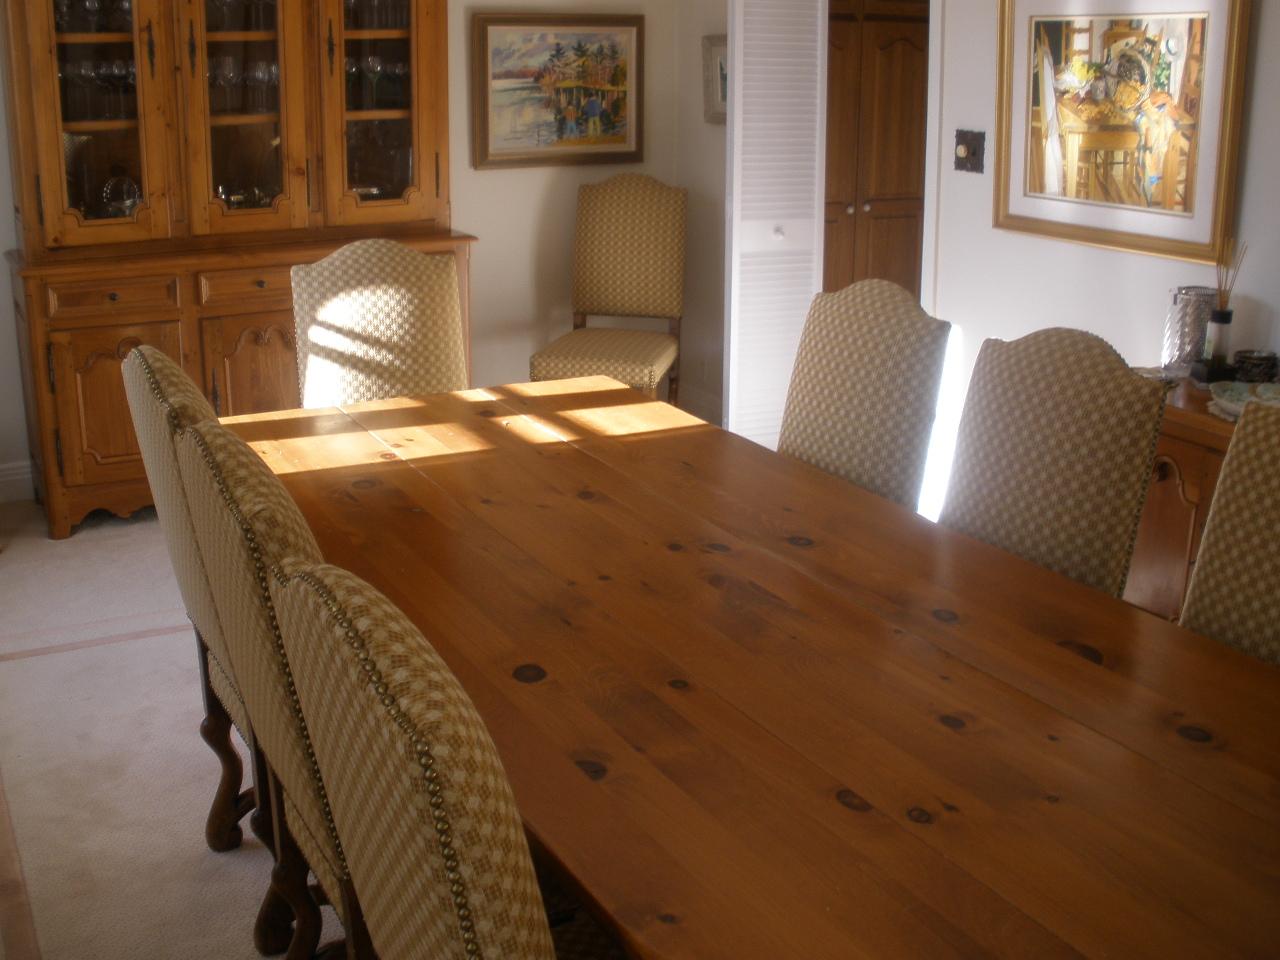 Rembourrage Larrivee Chaise Cuisine Decoration 3JPG